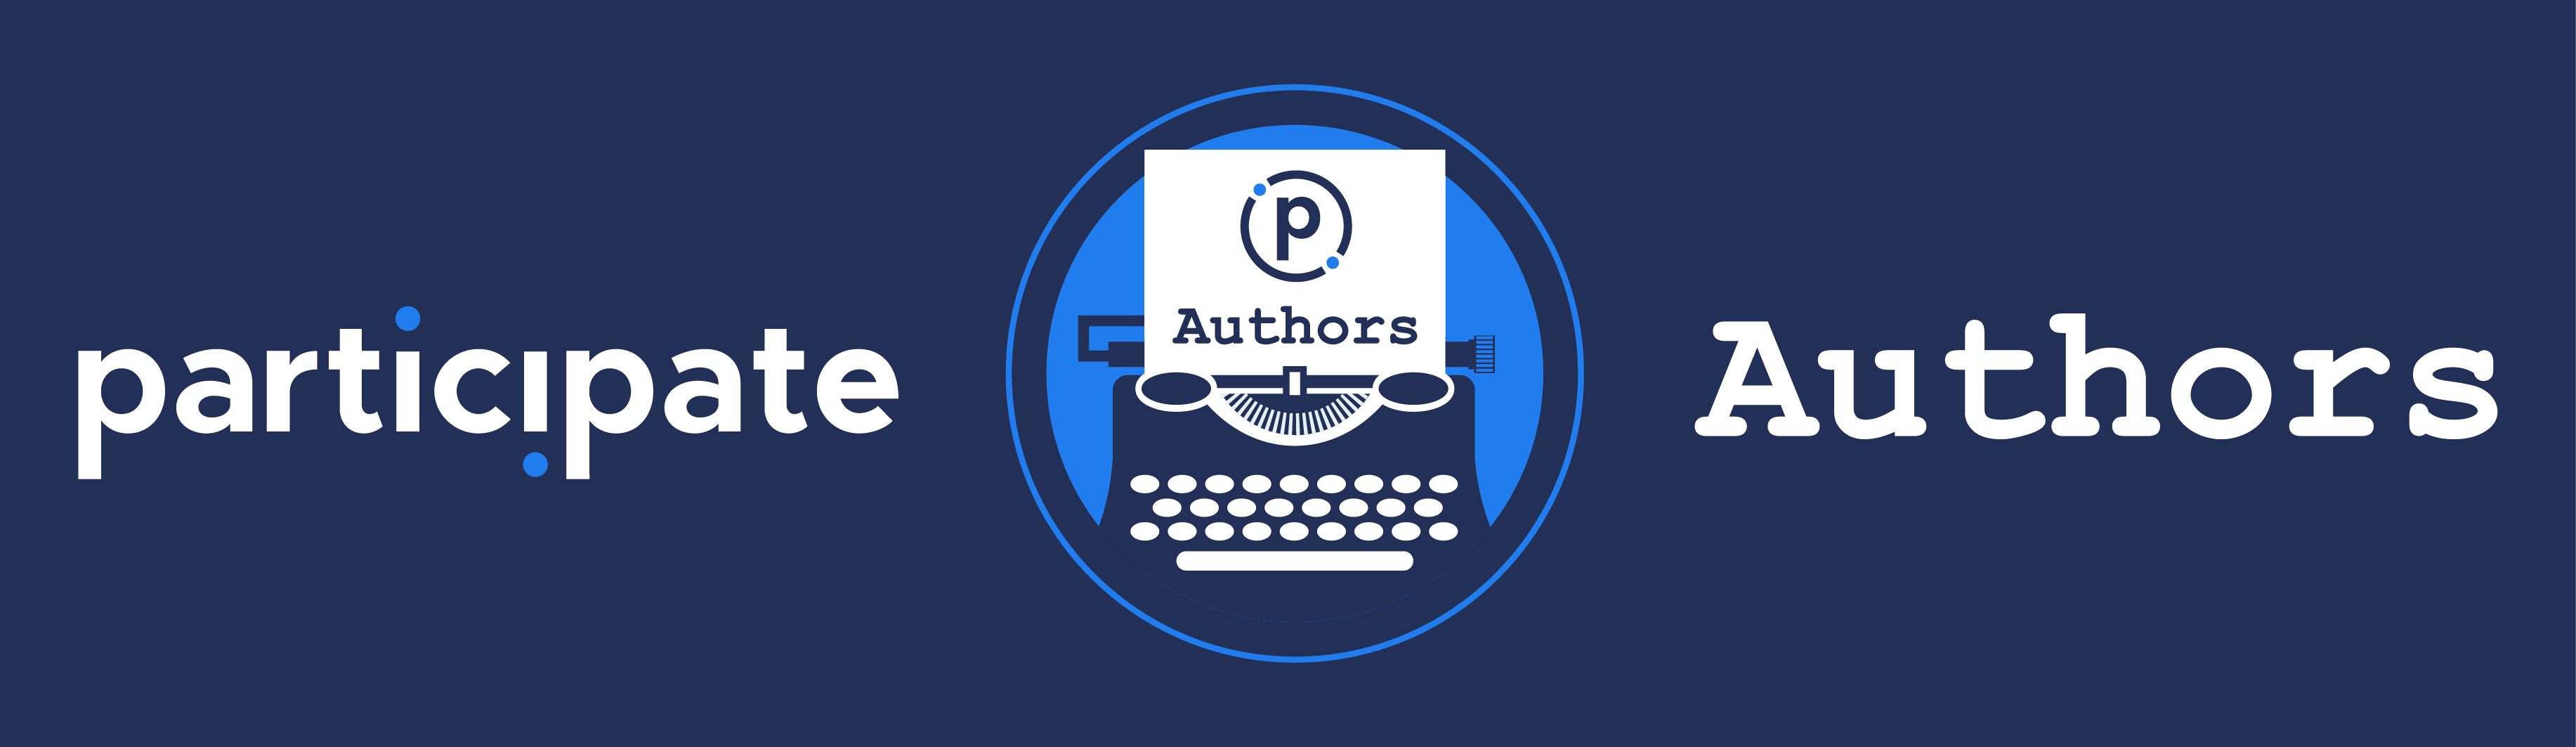 Participate authors participate participate authors 1betcityfo Gallery